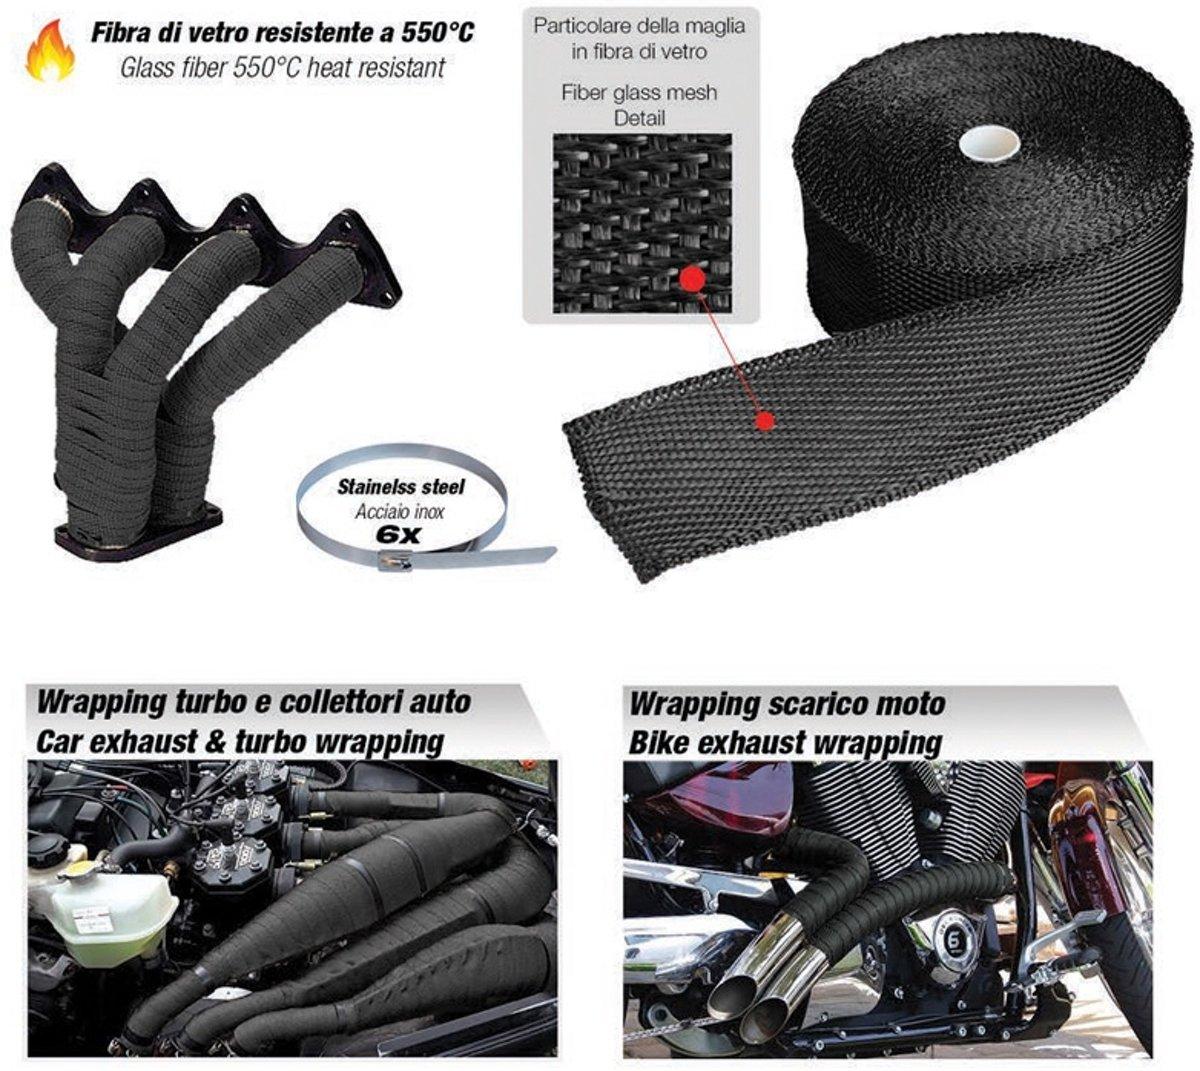 Simoni Racing Uitlaat Thermo Wrap Kit - 508mm X 15,24mtr + 6 Clips -550C kopen